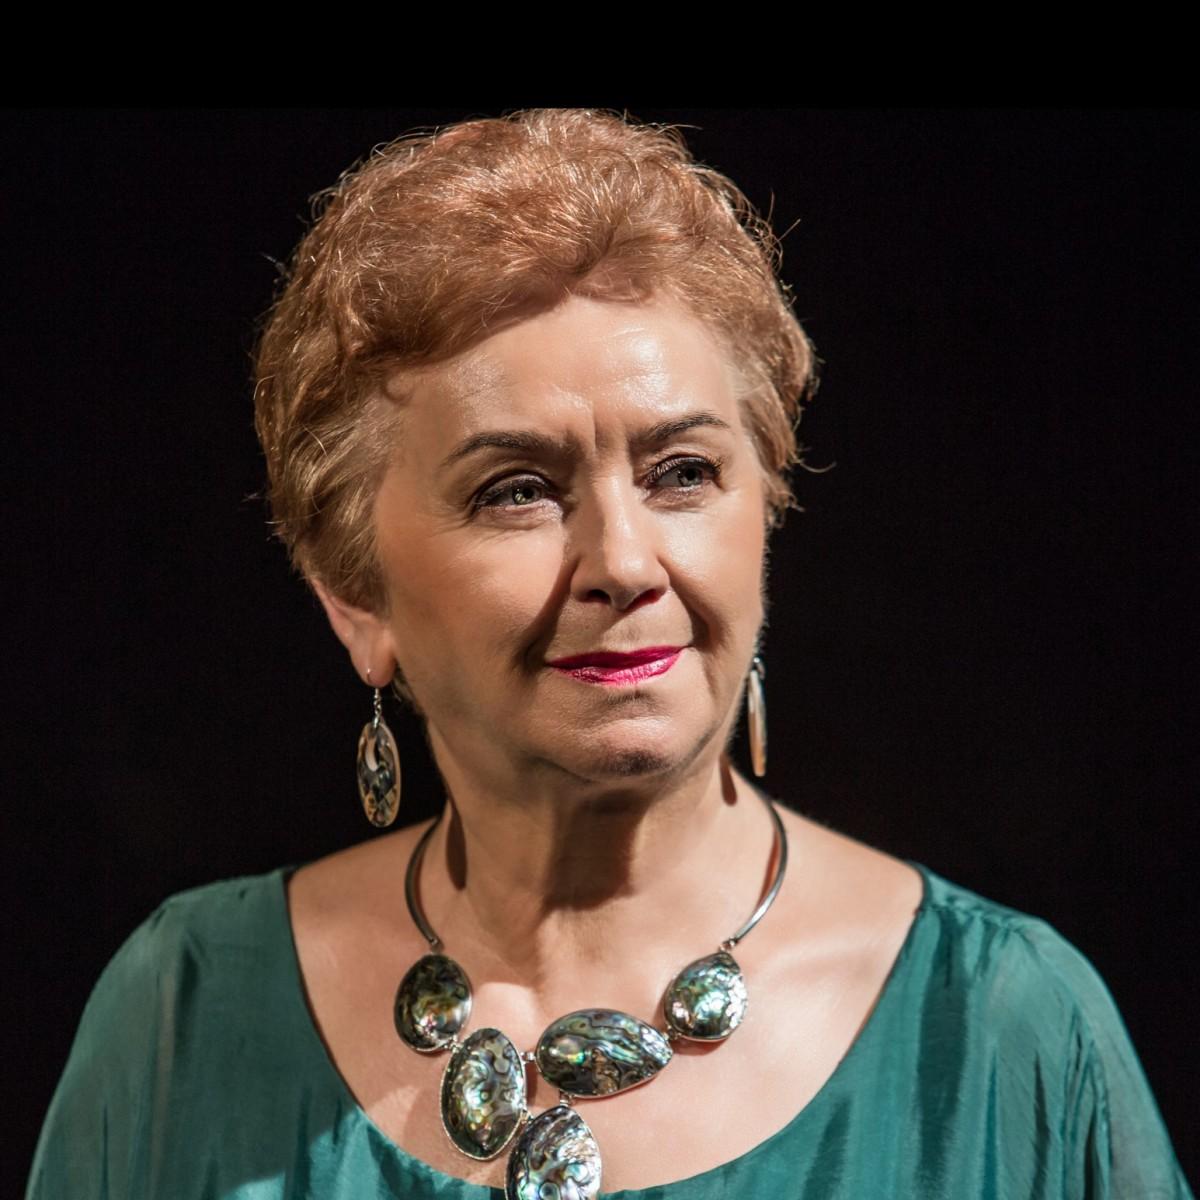 Aurora Prodan